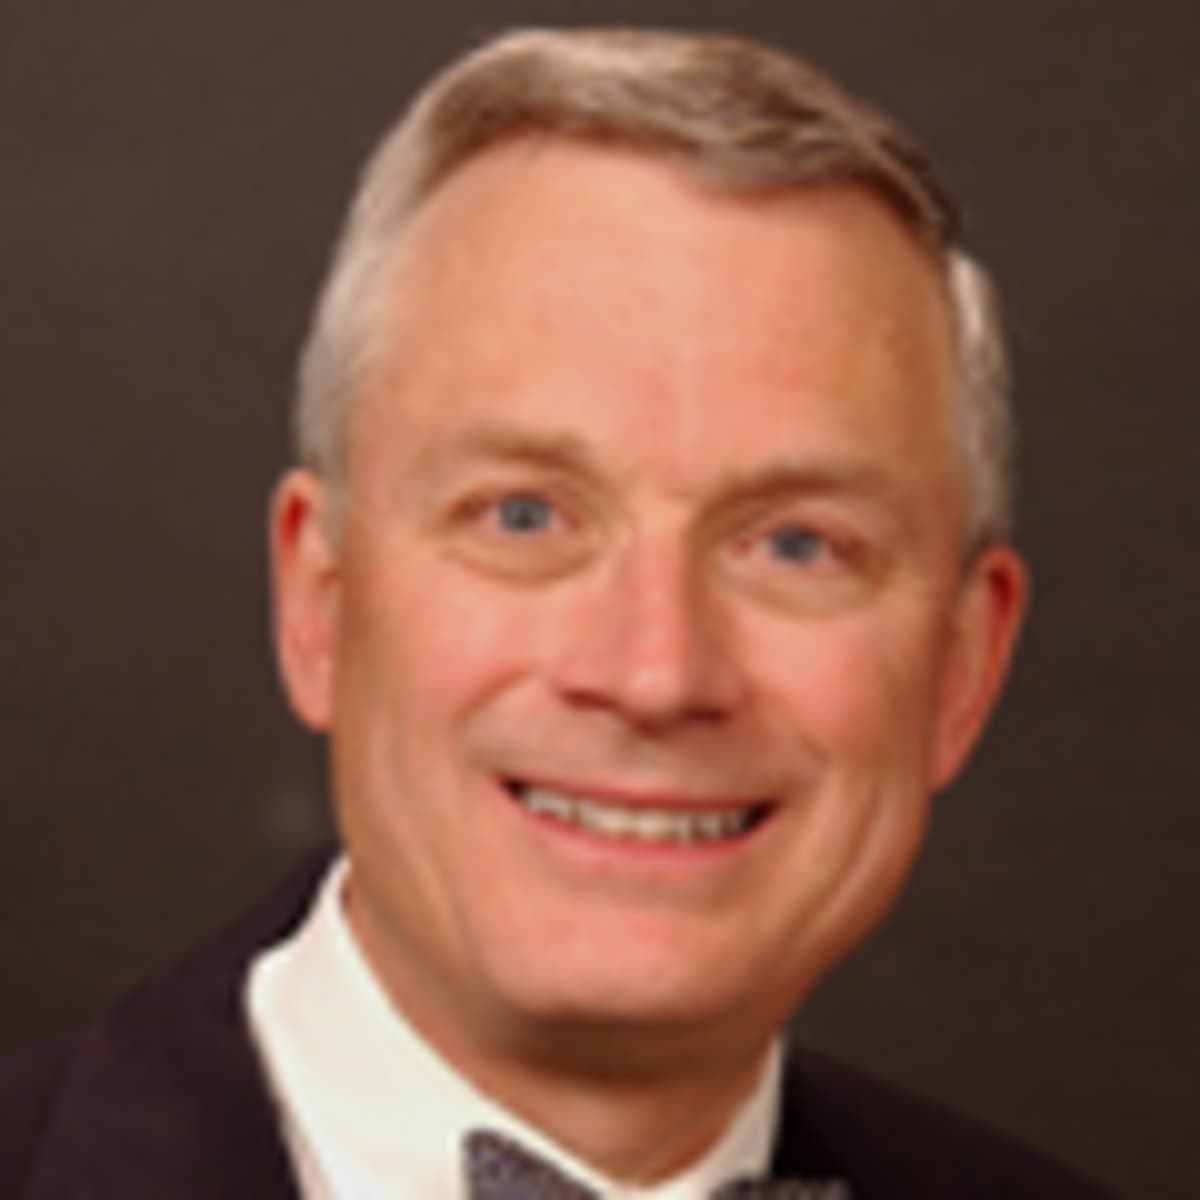 Video | Dr. James Todd, MD | Aurora, CO | Pediatrician